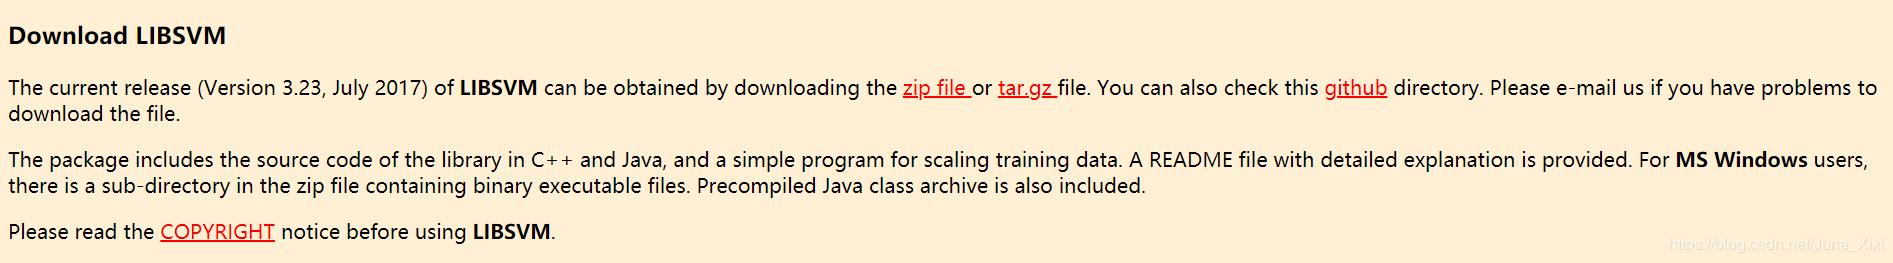 Install libsvm toolbox on Matlab R2018b under windows64 bit